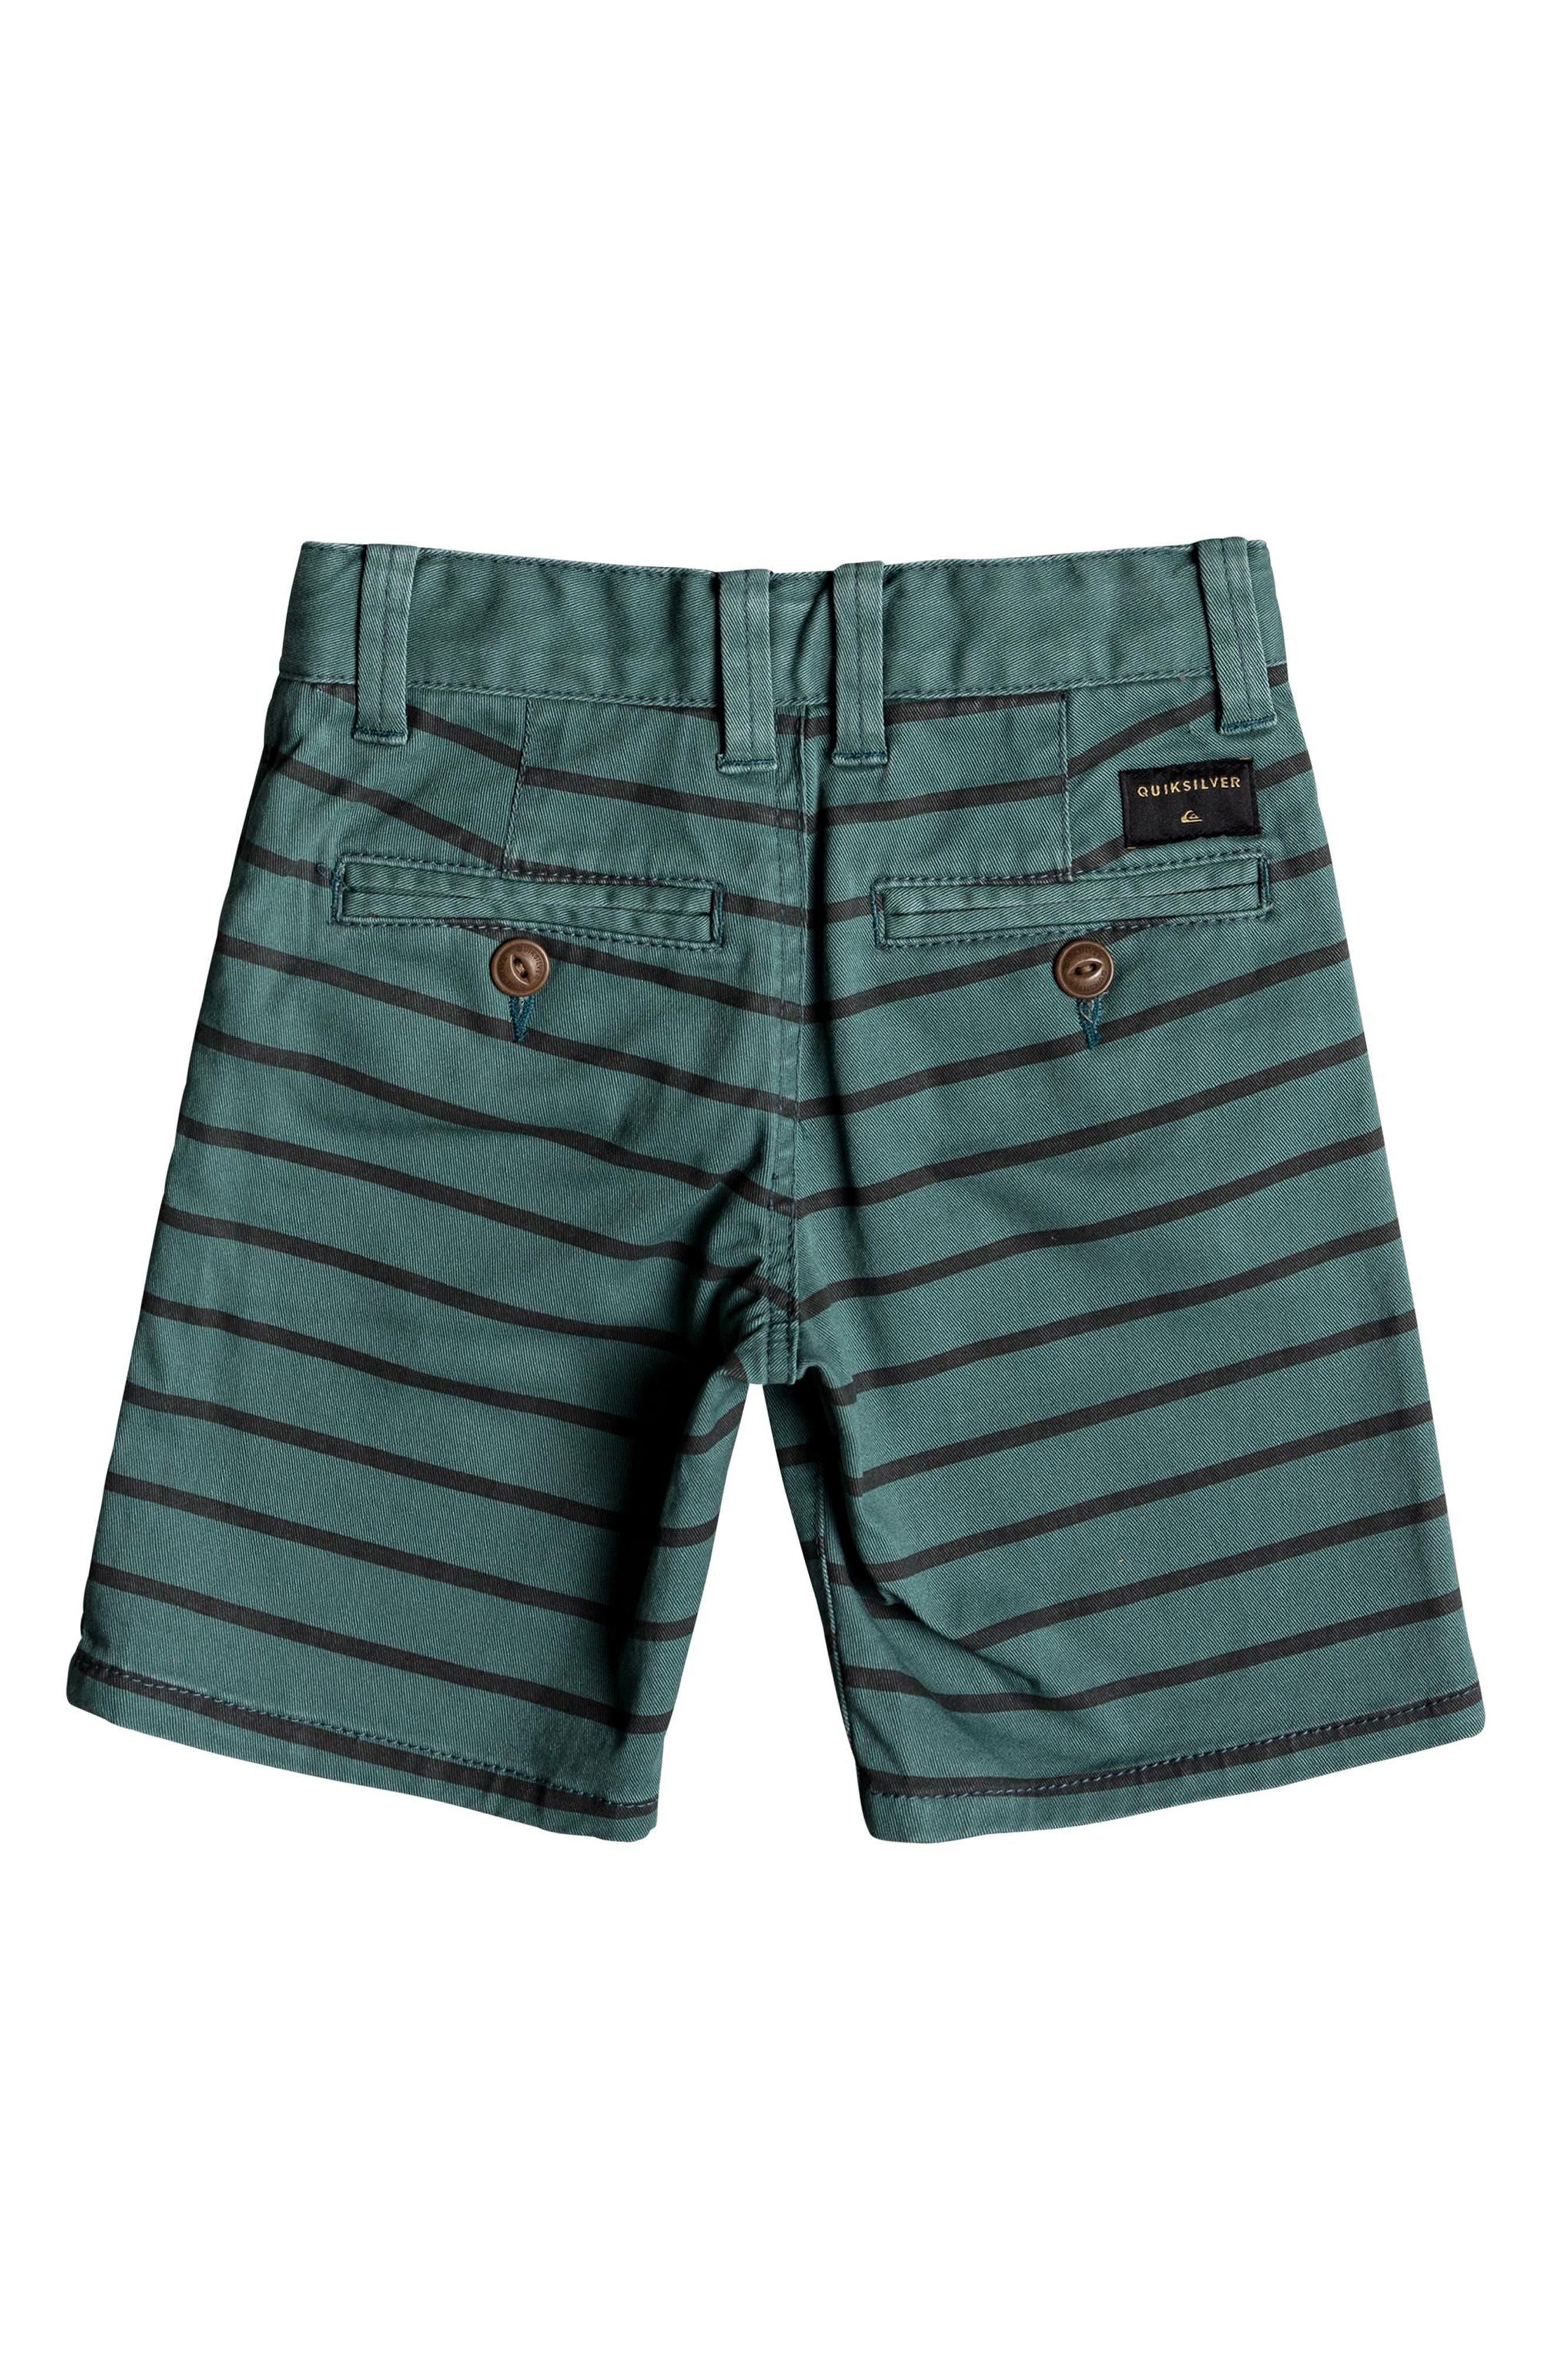 Waiku Stripe Shorts,                             Alternate thumbnail 2, color,                             MALLARD GREEN